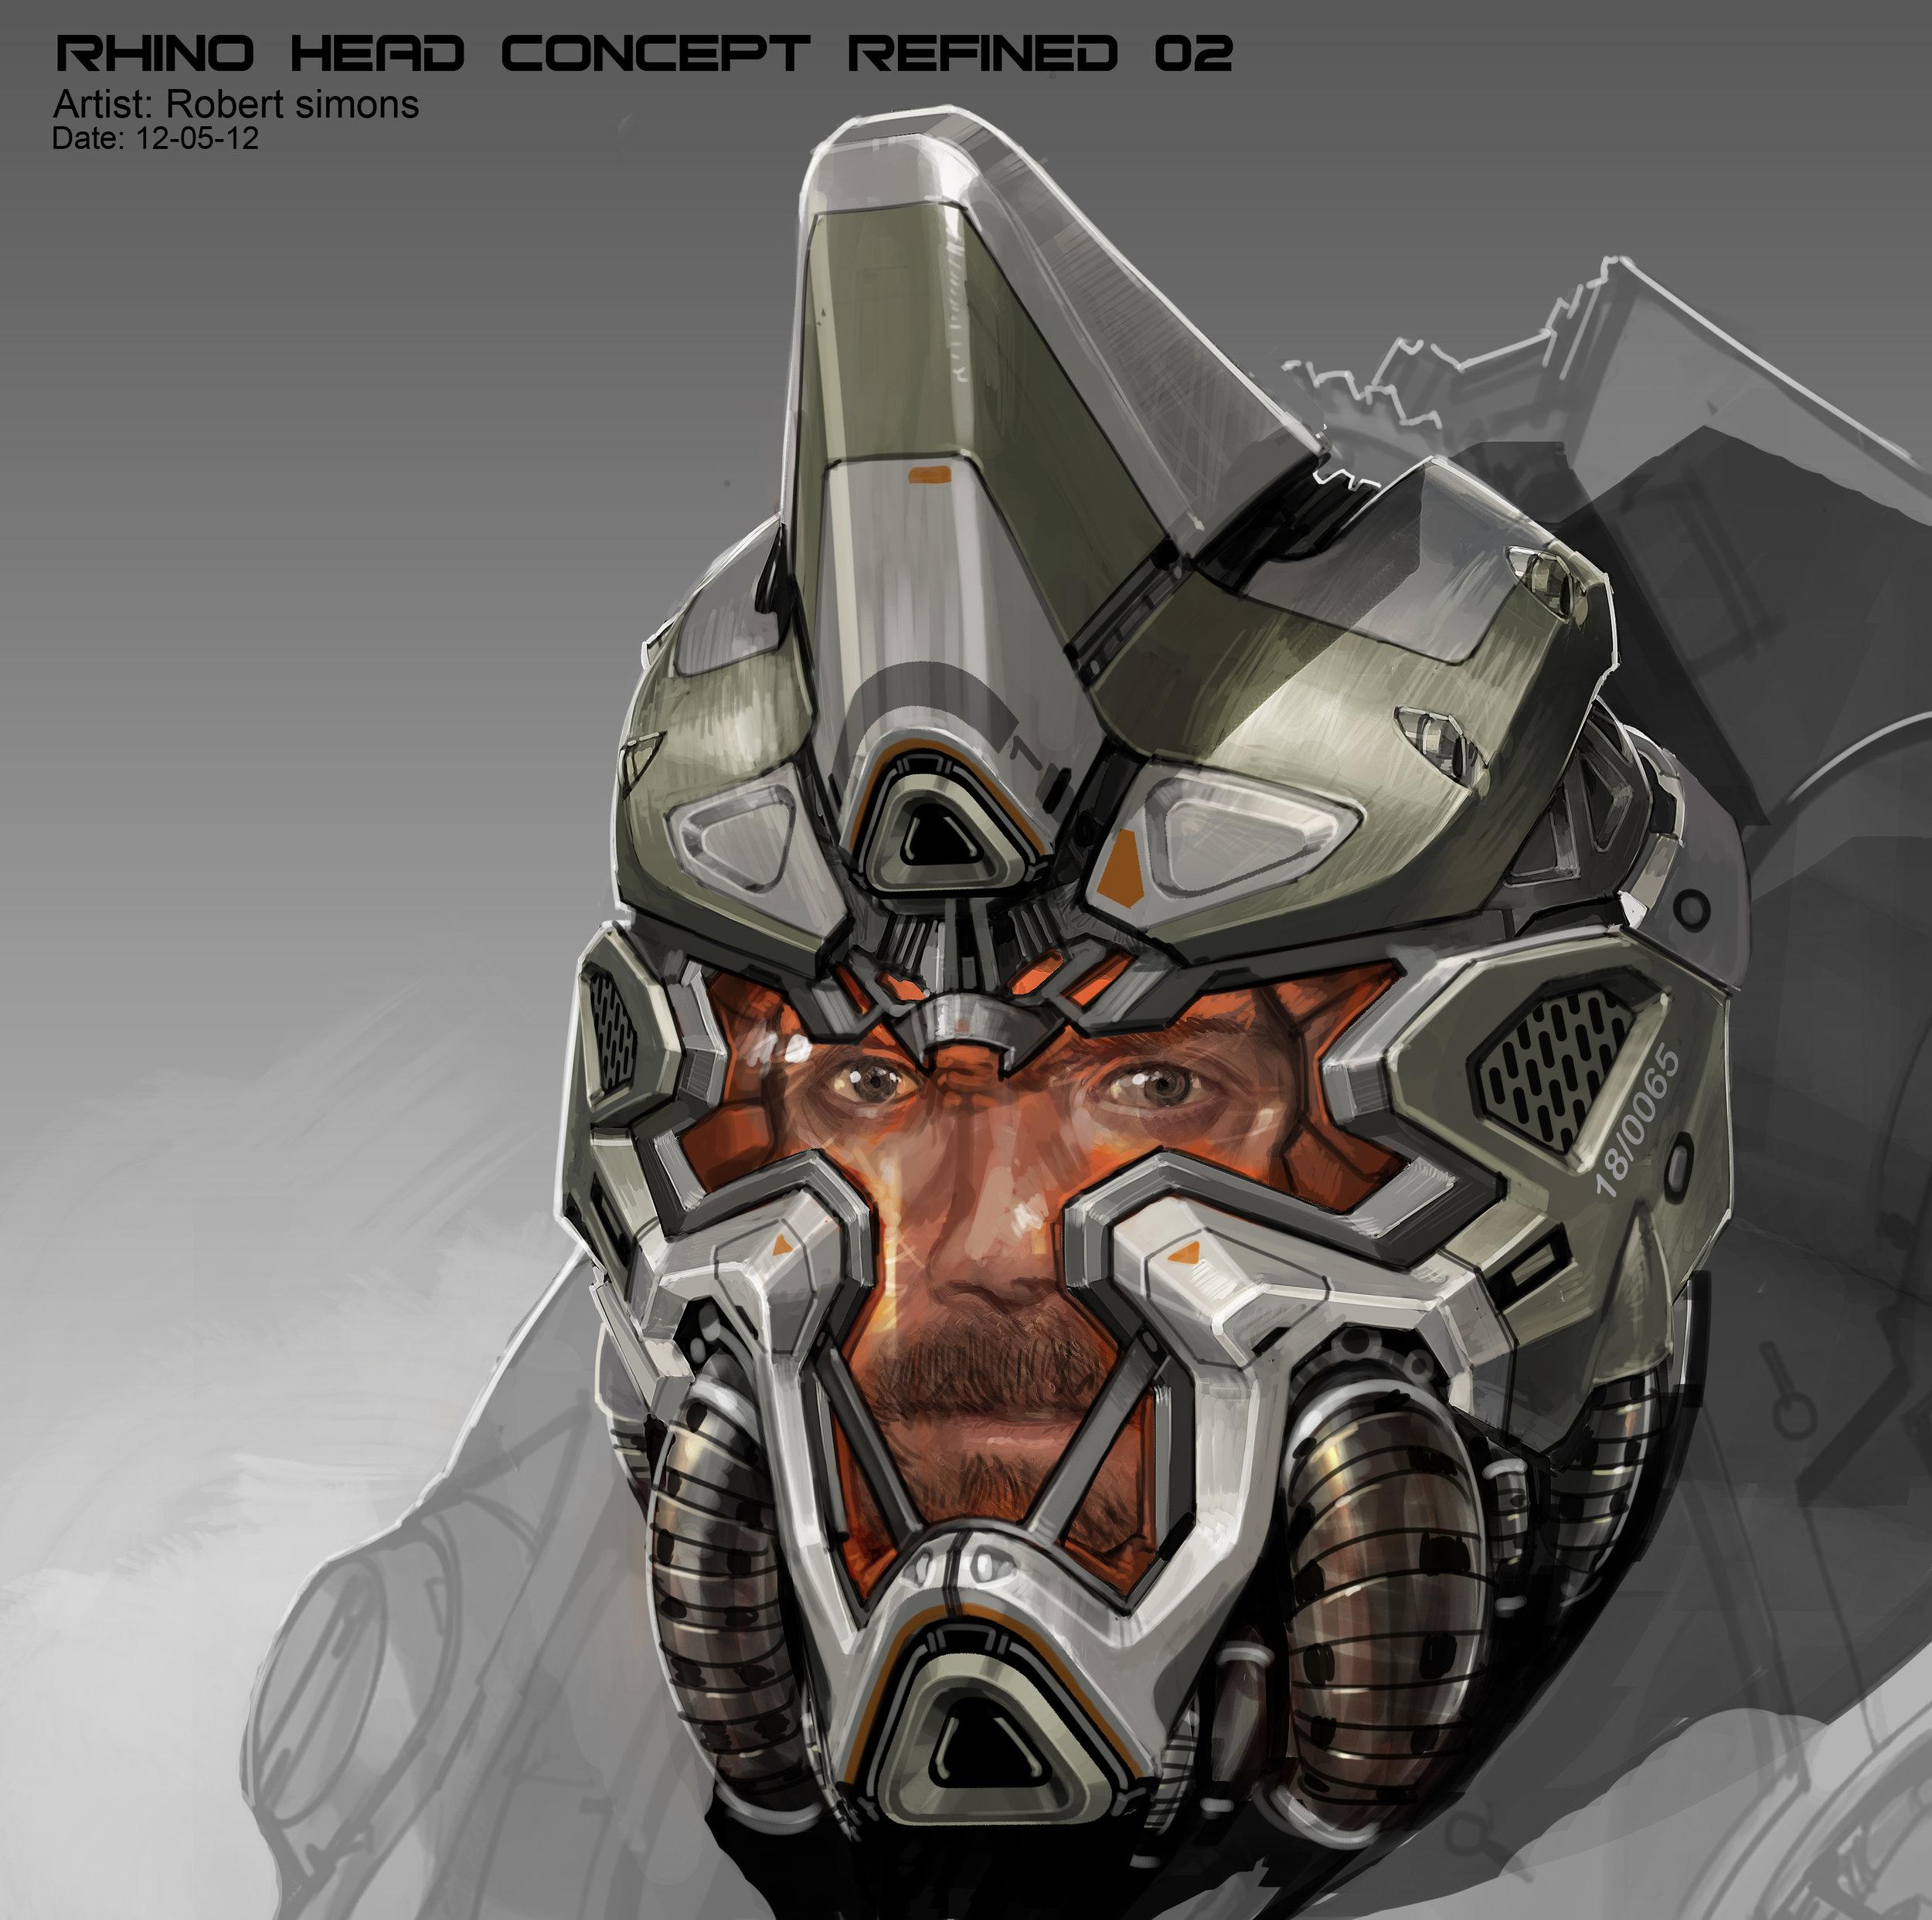 rhino_HeadConceptRefined02_120512_RS.jpg